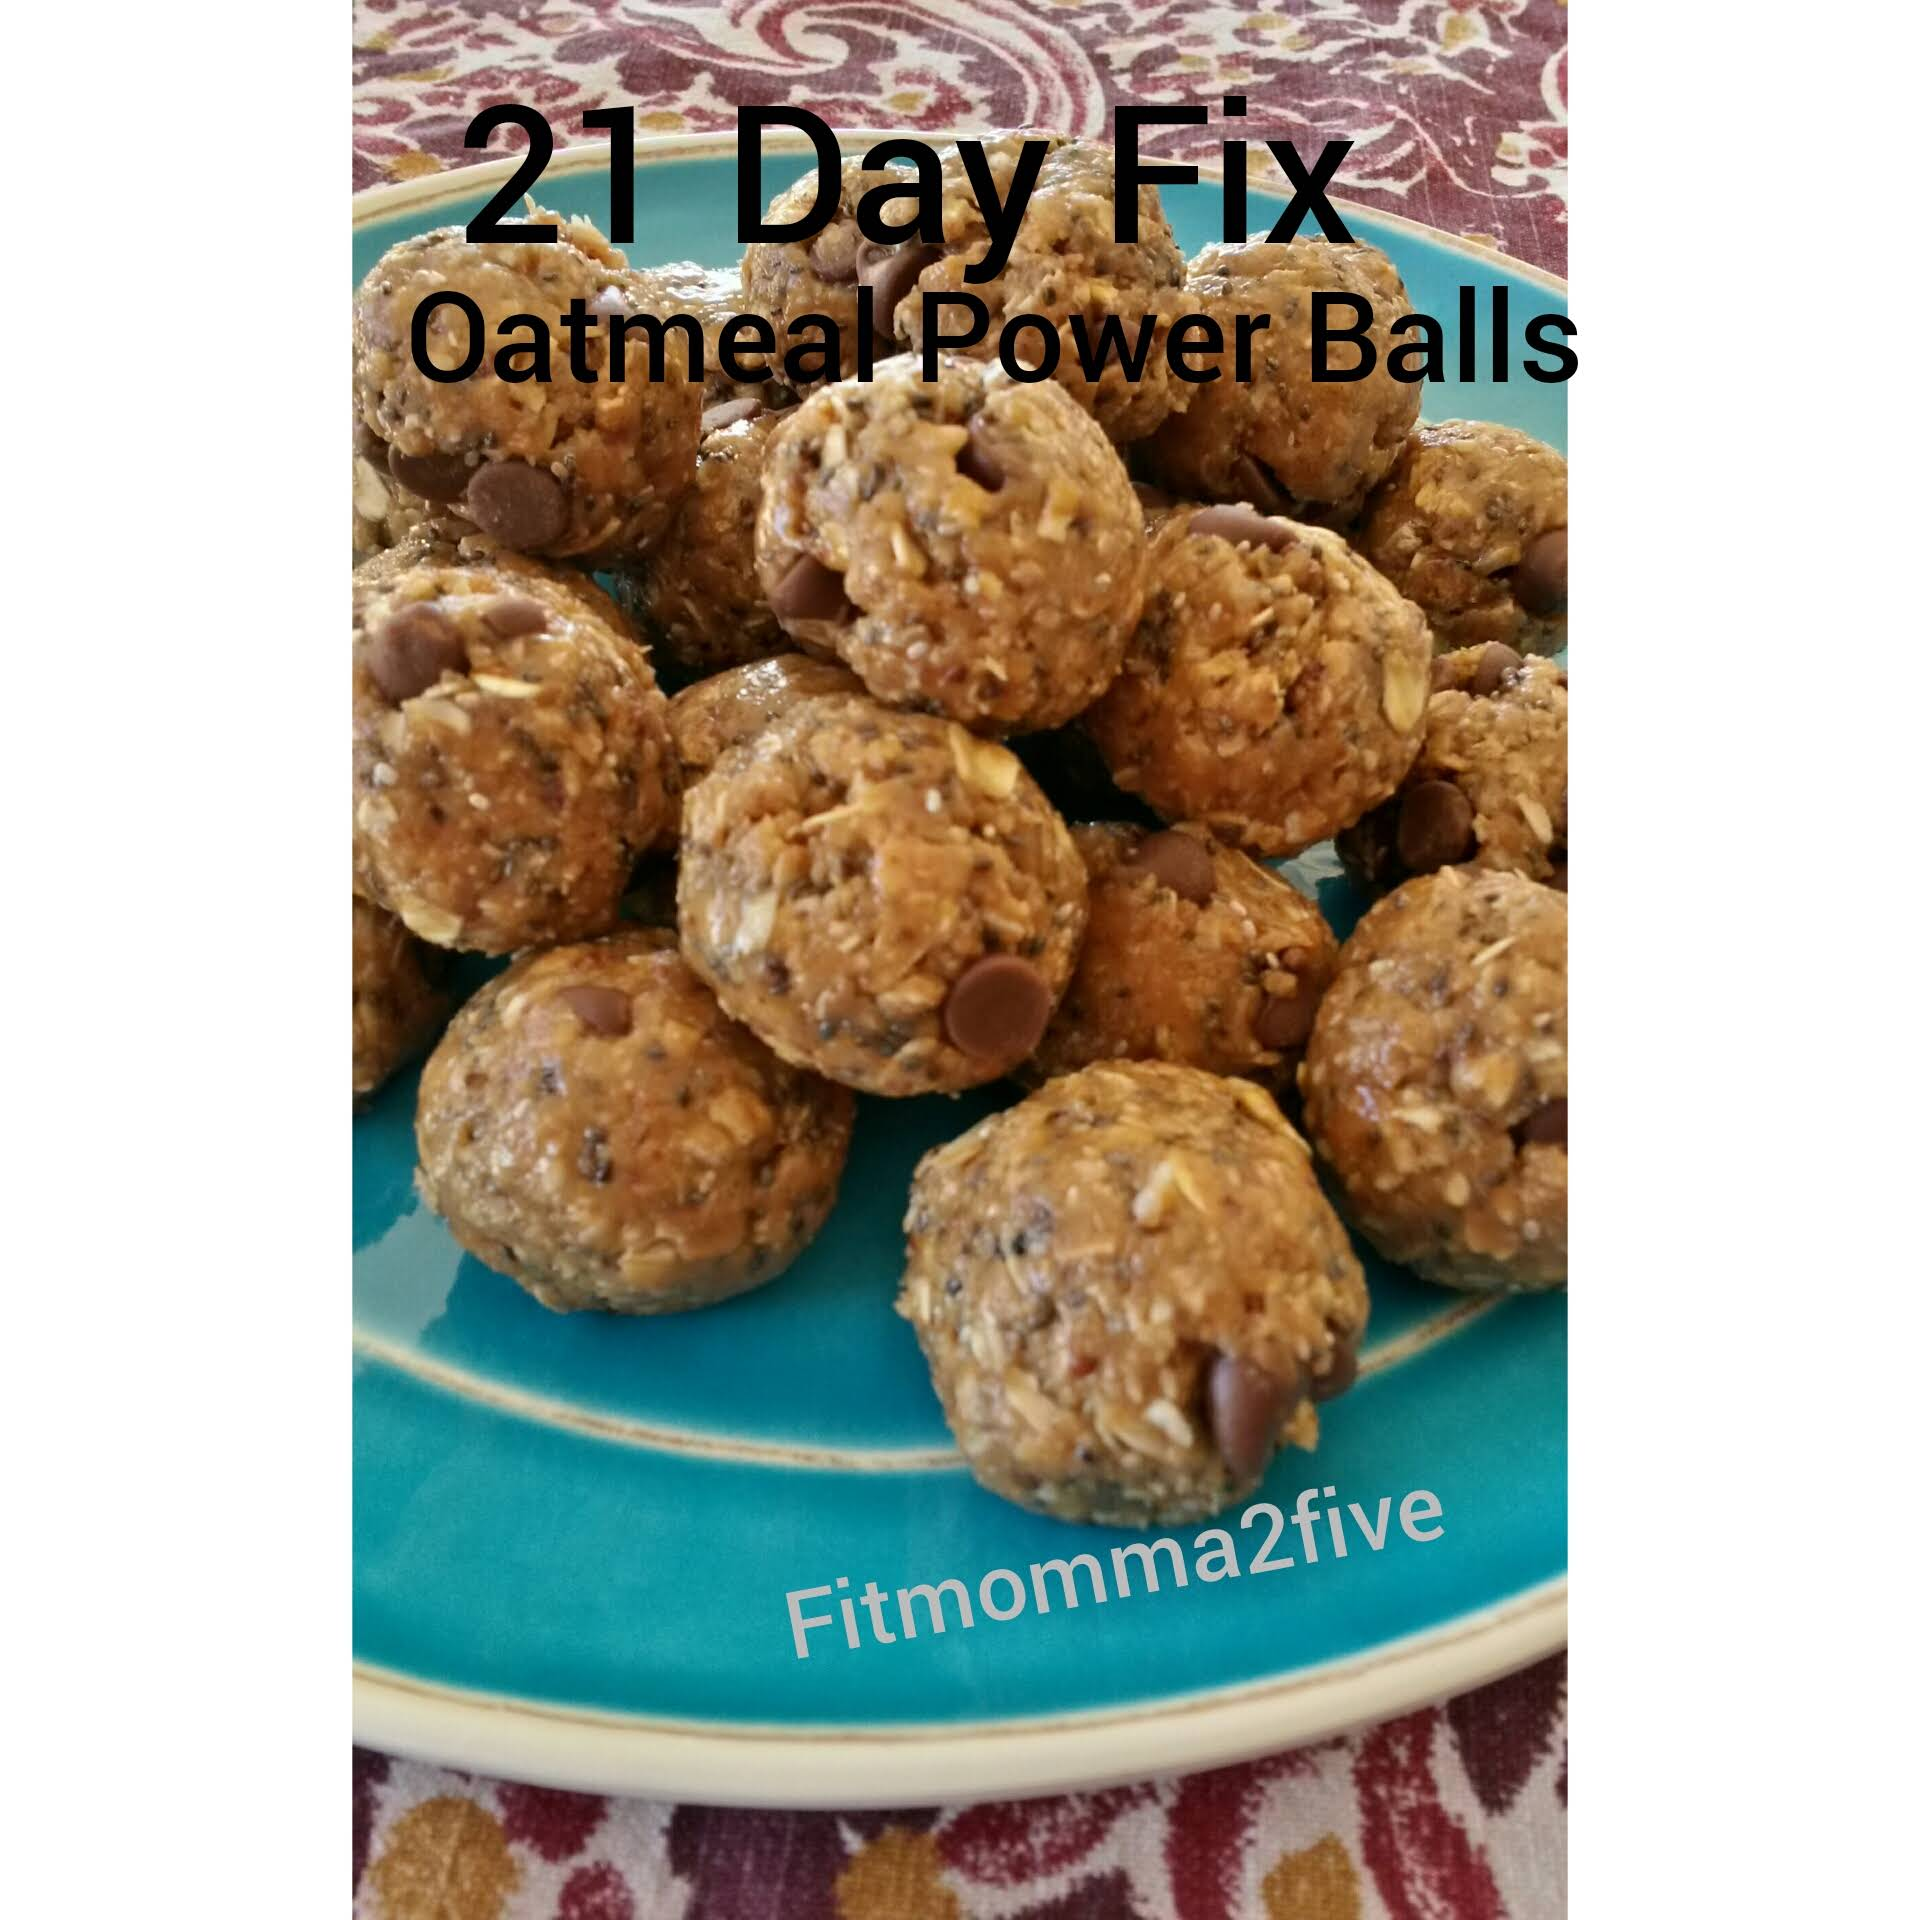 21 Day  glue Oatmeal  capability Balls